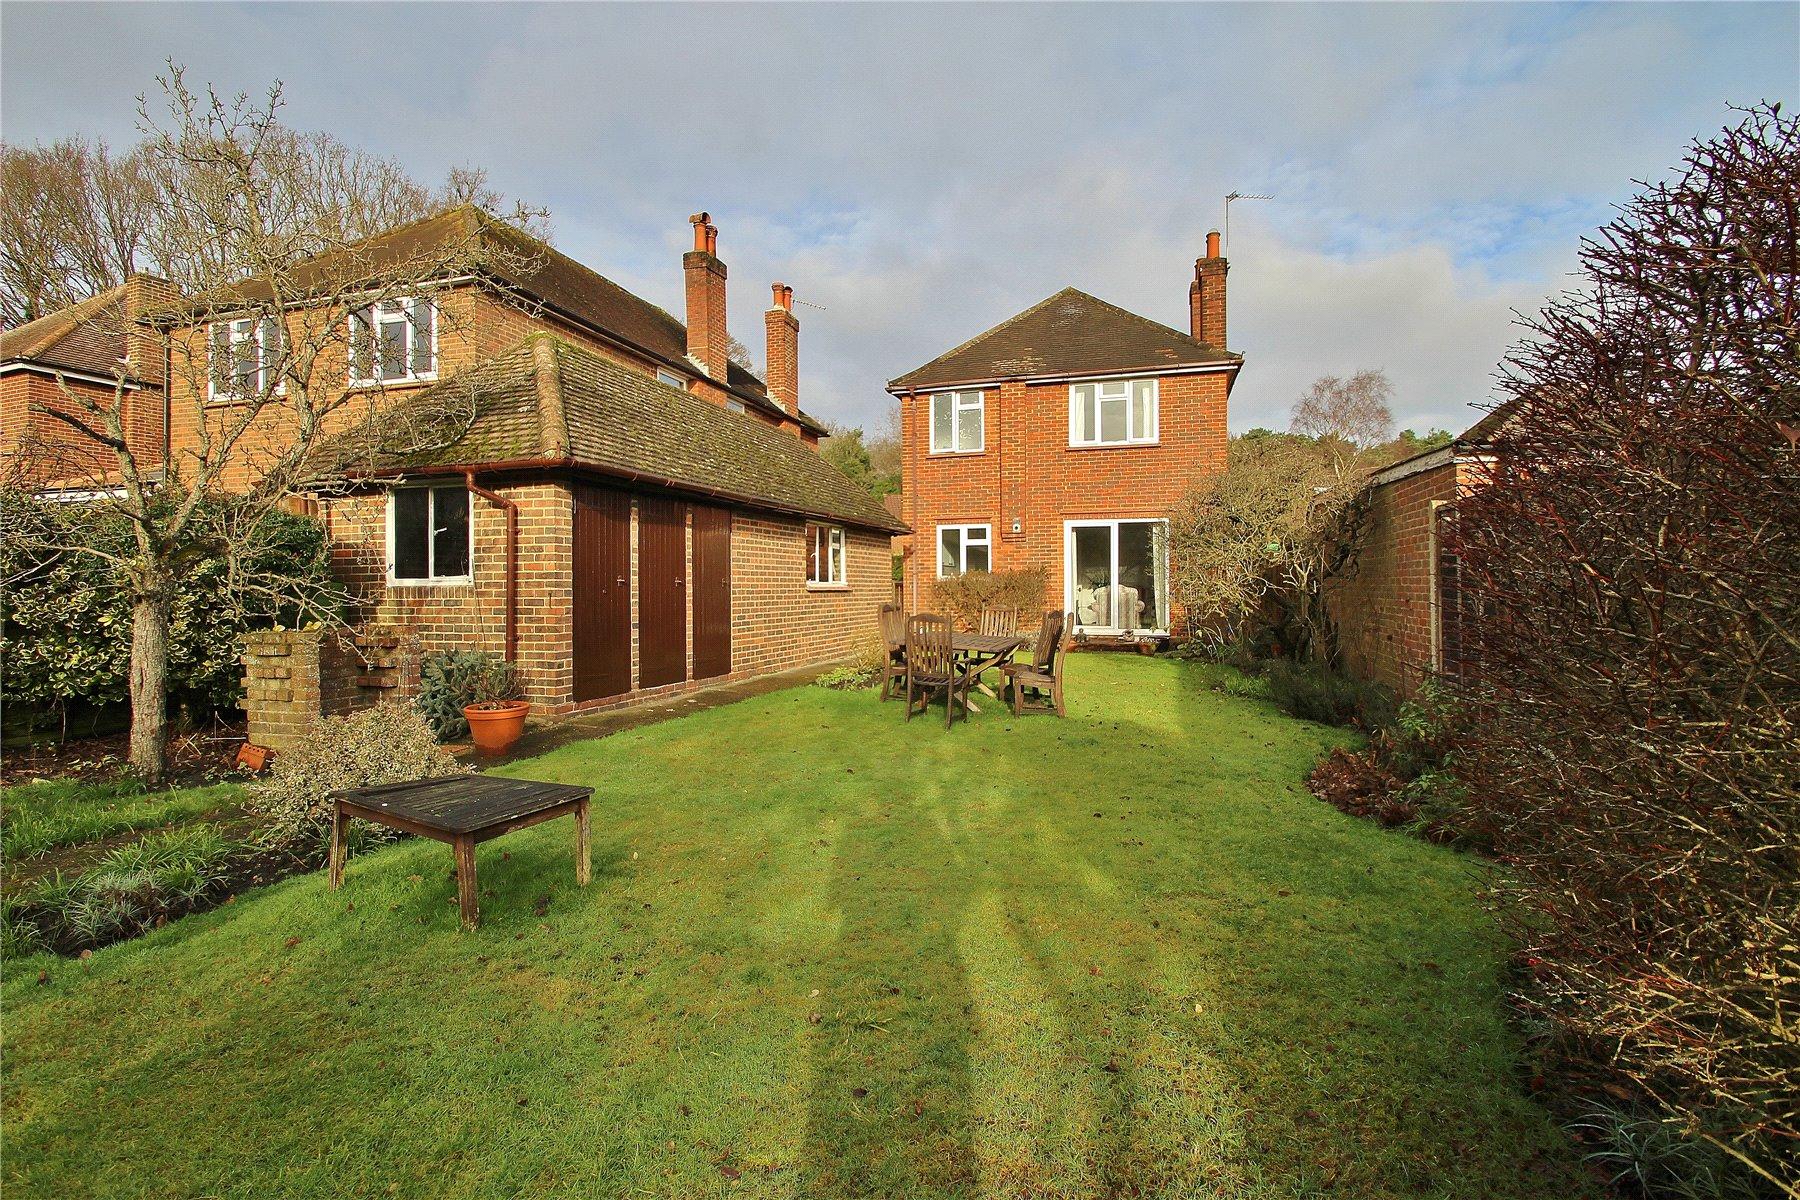 3 Bedroom Detached House For Sale In Surrey